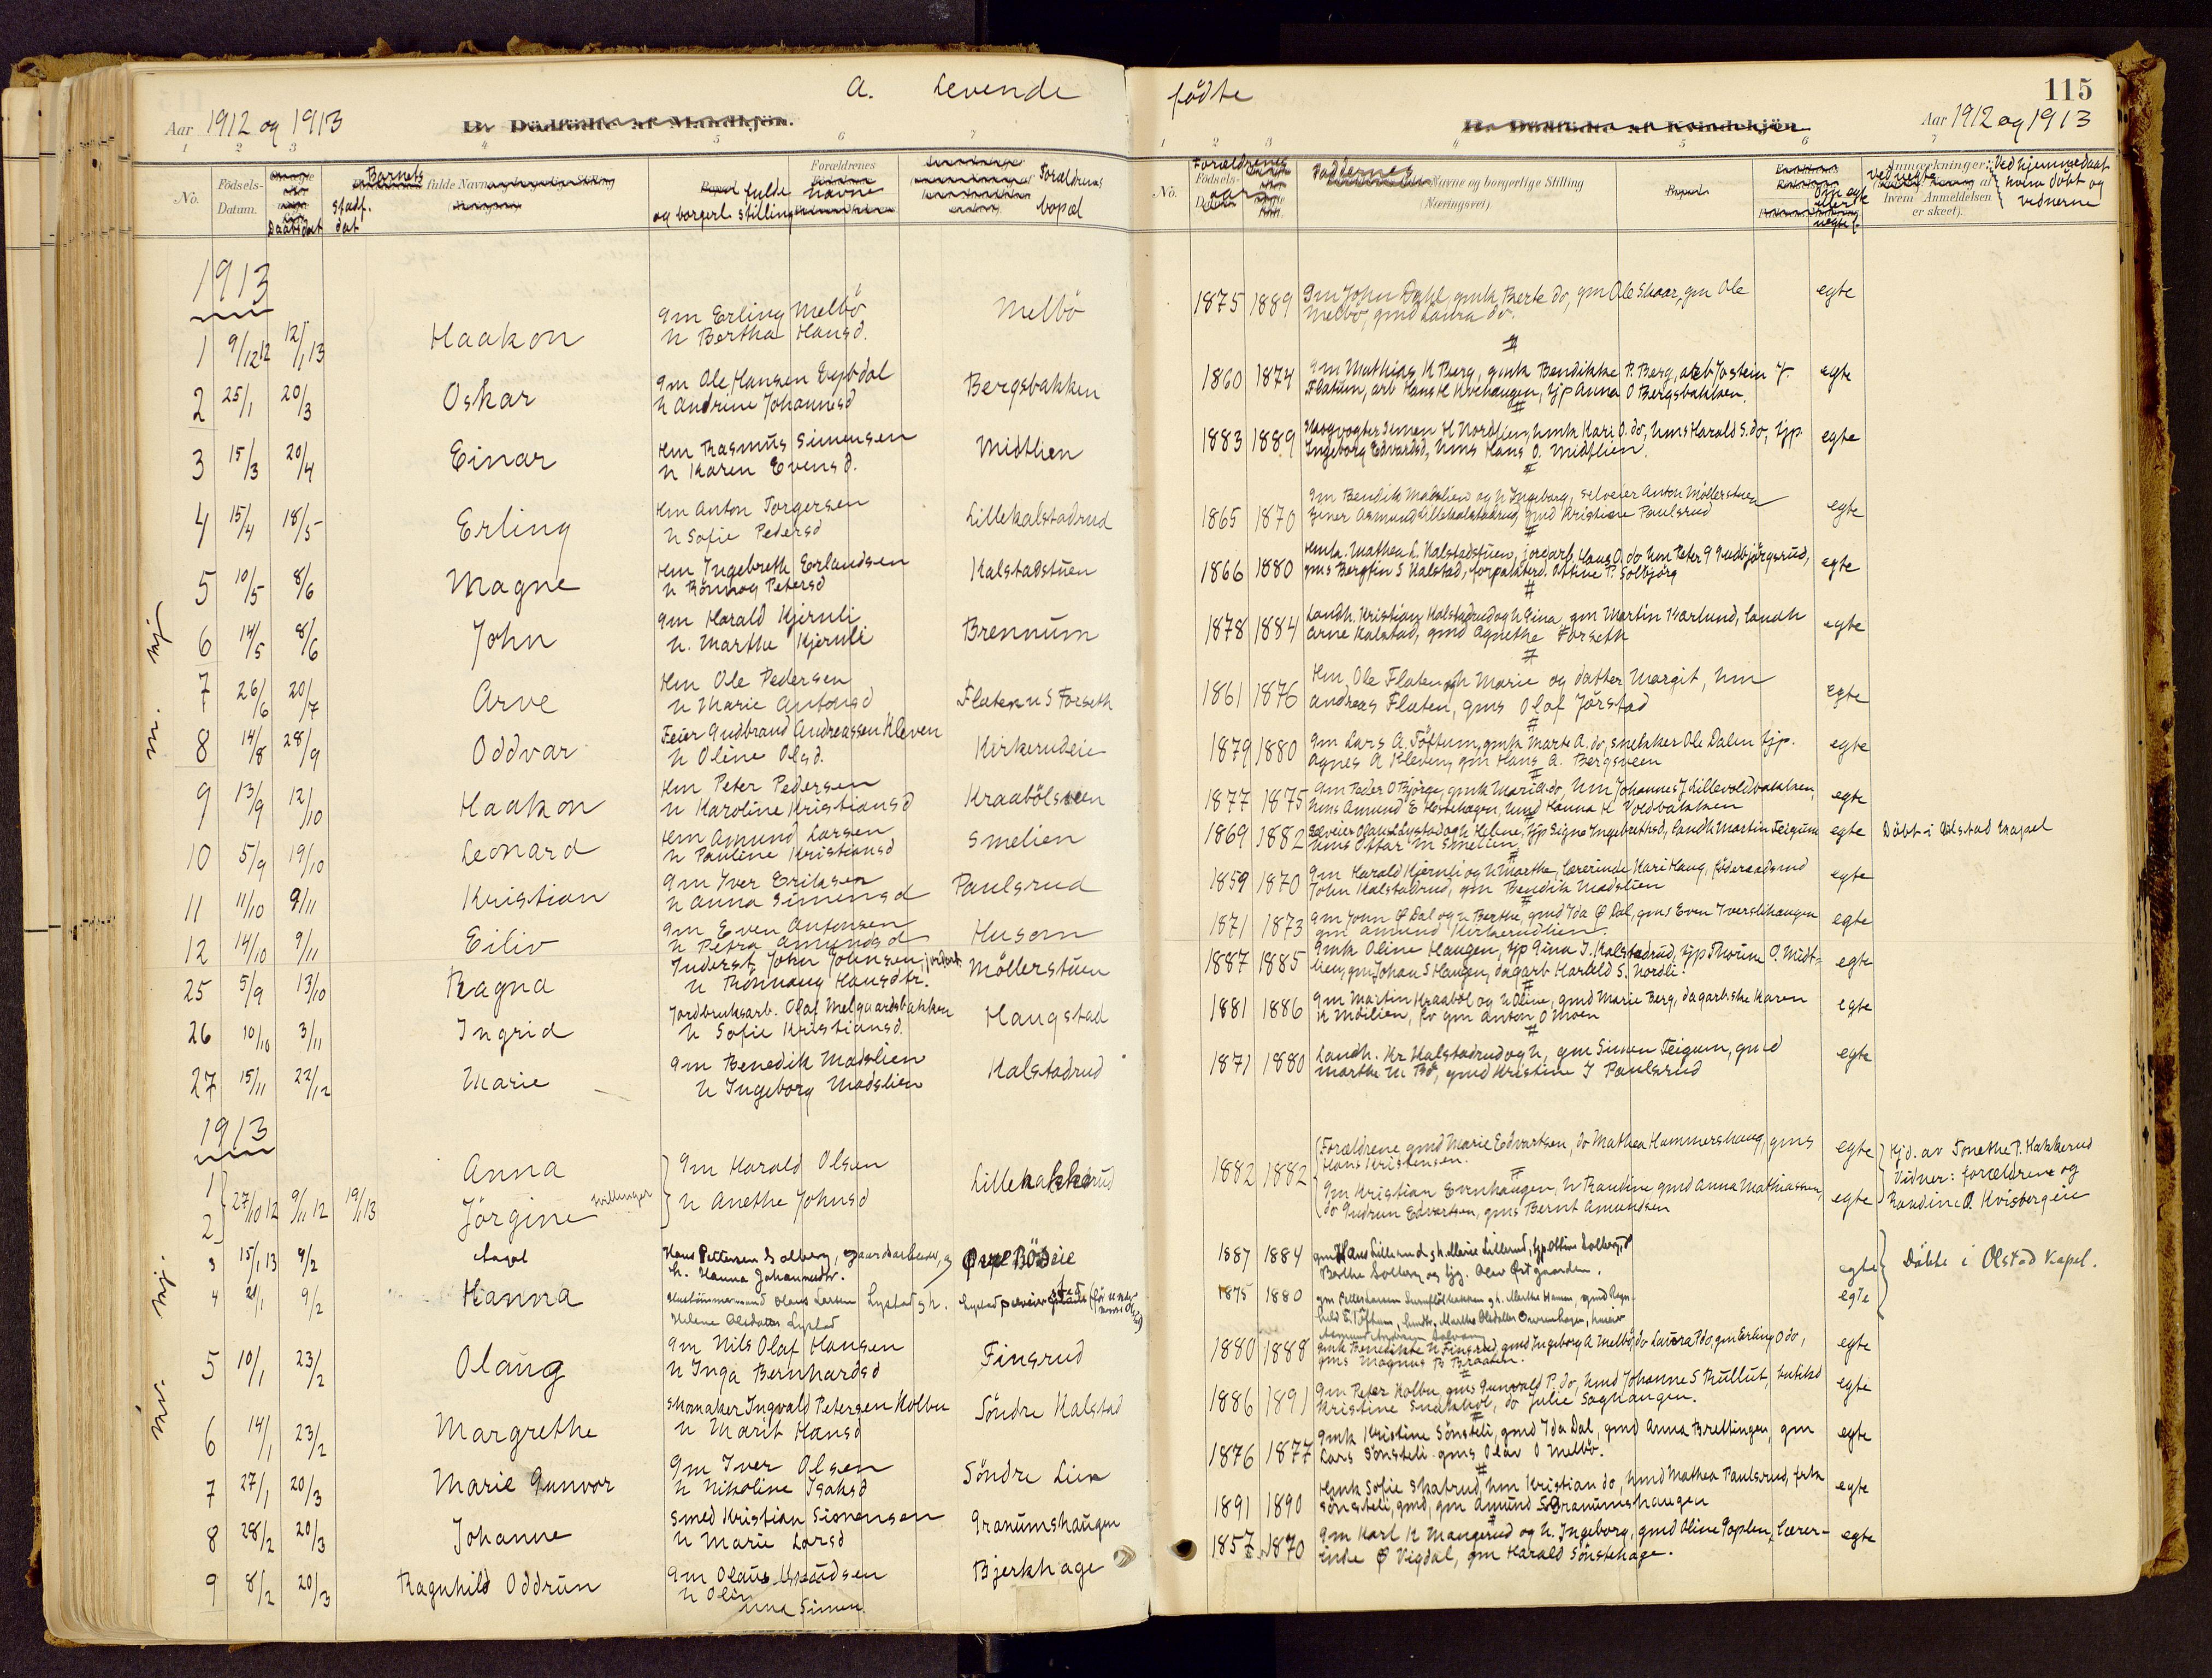 SAH, Vestre Gausdal prestekontor, Ministerialbok nr. 1, 1887-1914, s. 115